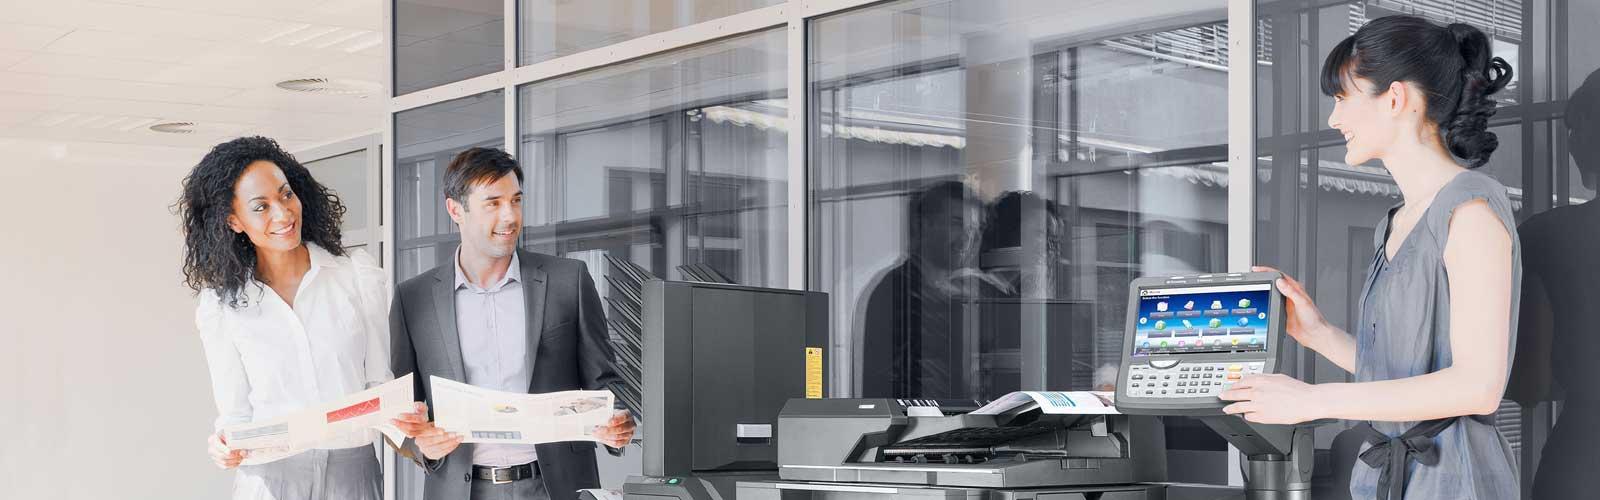 Servicio Técnico Impresoras Mita